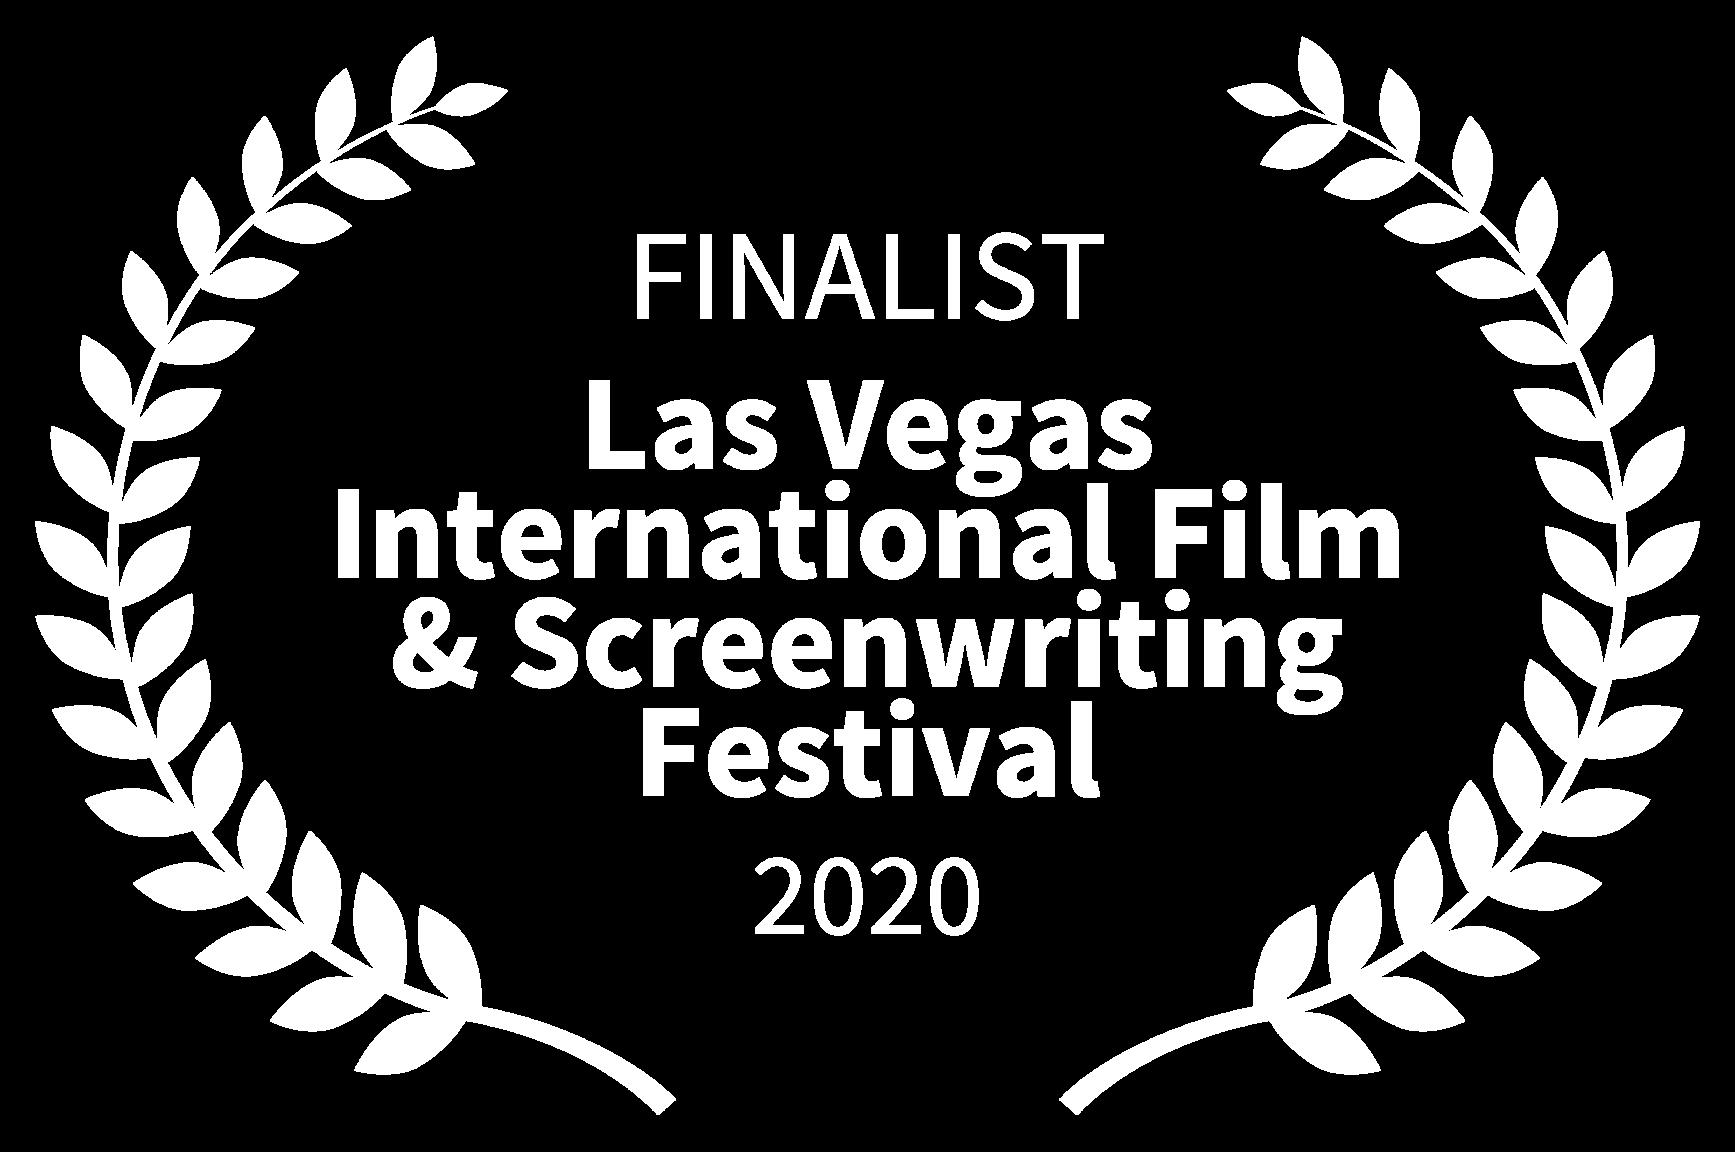 FINALIST - Las Vegas International Film Screenwriting Festival - 2020